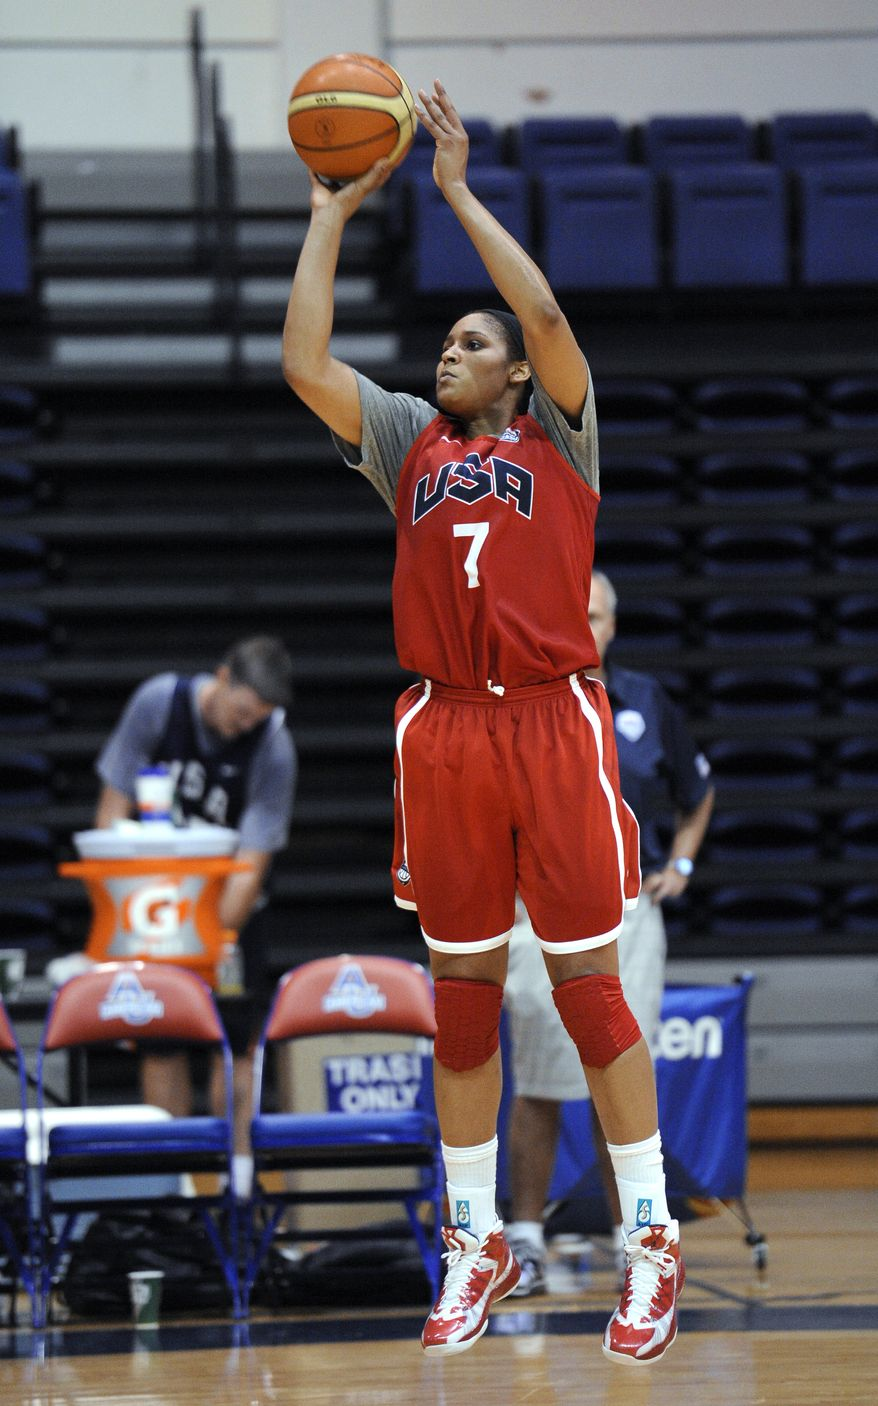 U.S. women's Olympic basketball team forward Maya Moore takes a shot during practice, Saturday, July 14, 2012, in Washington. (AP Photo/Nick Wass)